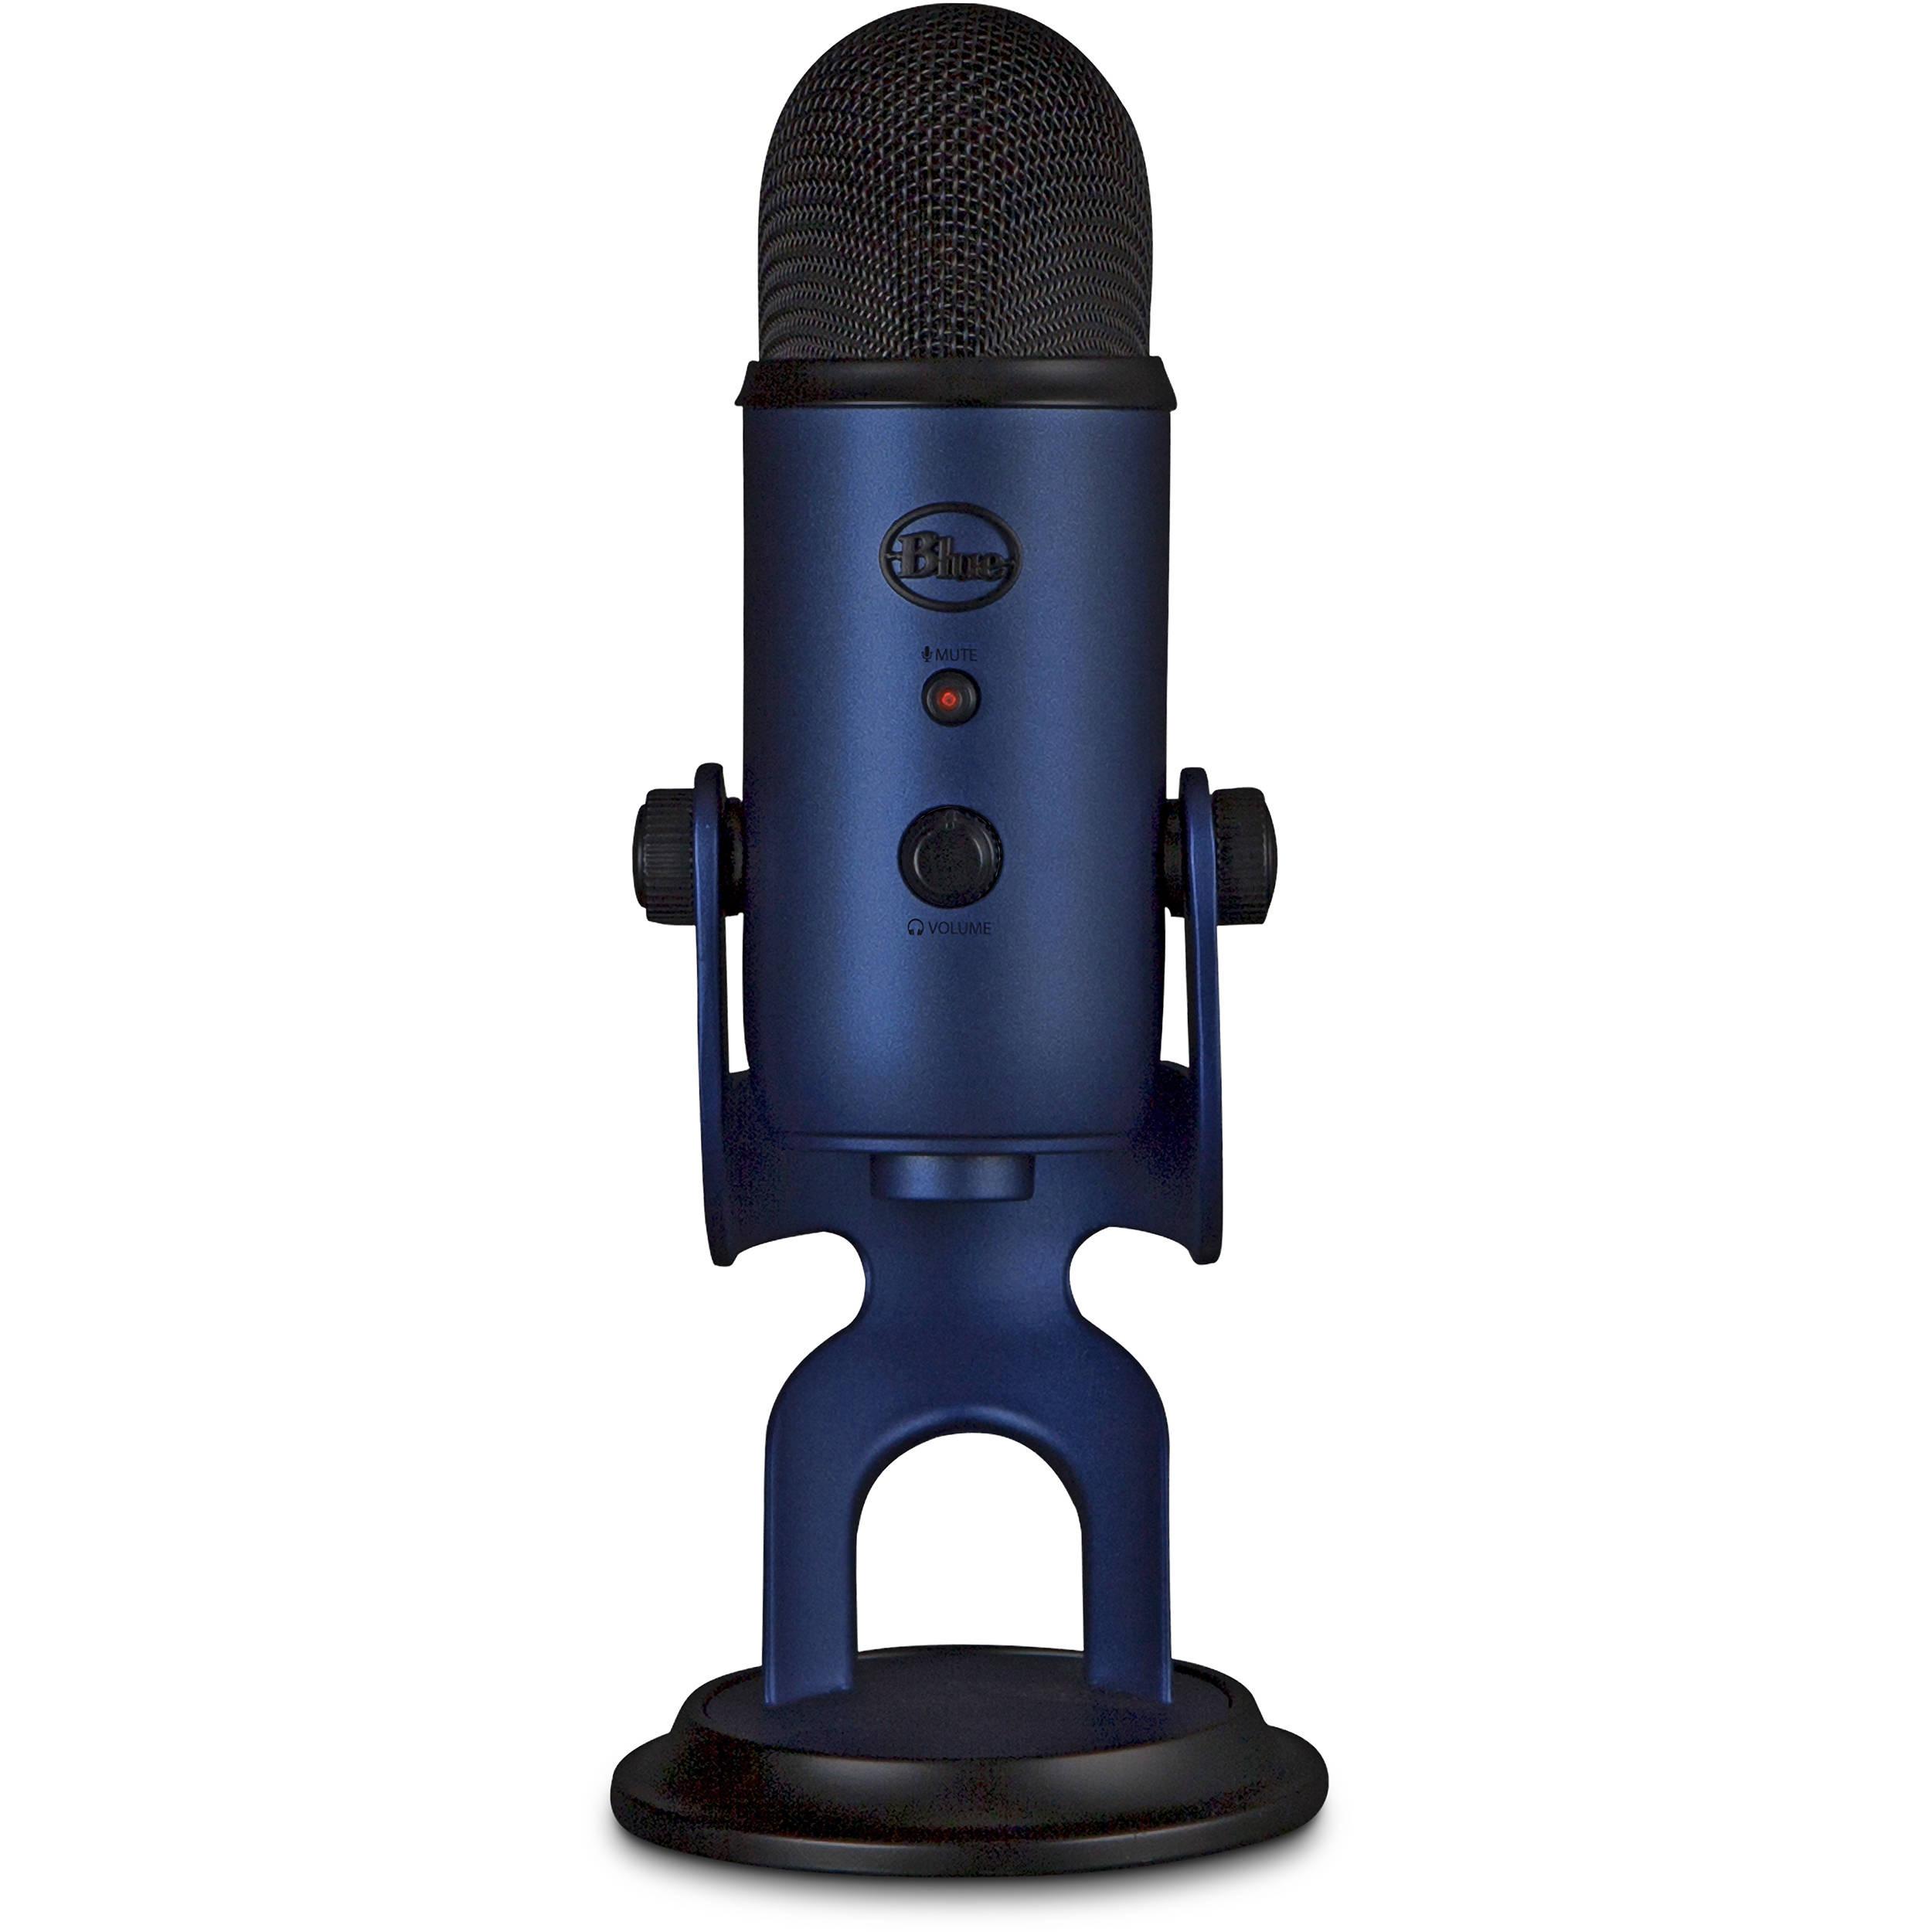 Blue Yeti USB Microphone (Midnight Blue) 988-000101 B&H Photo